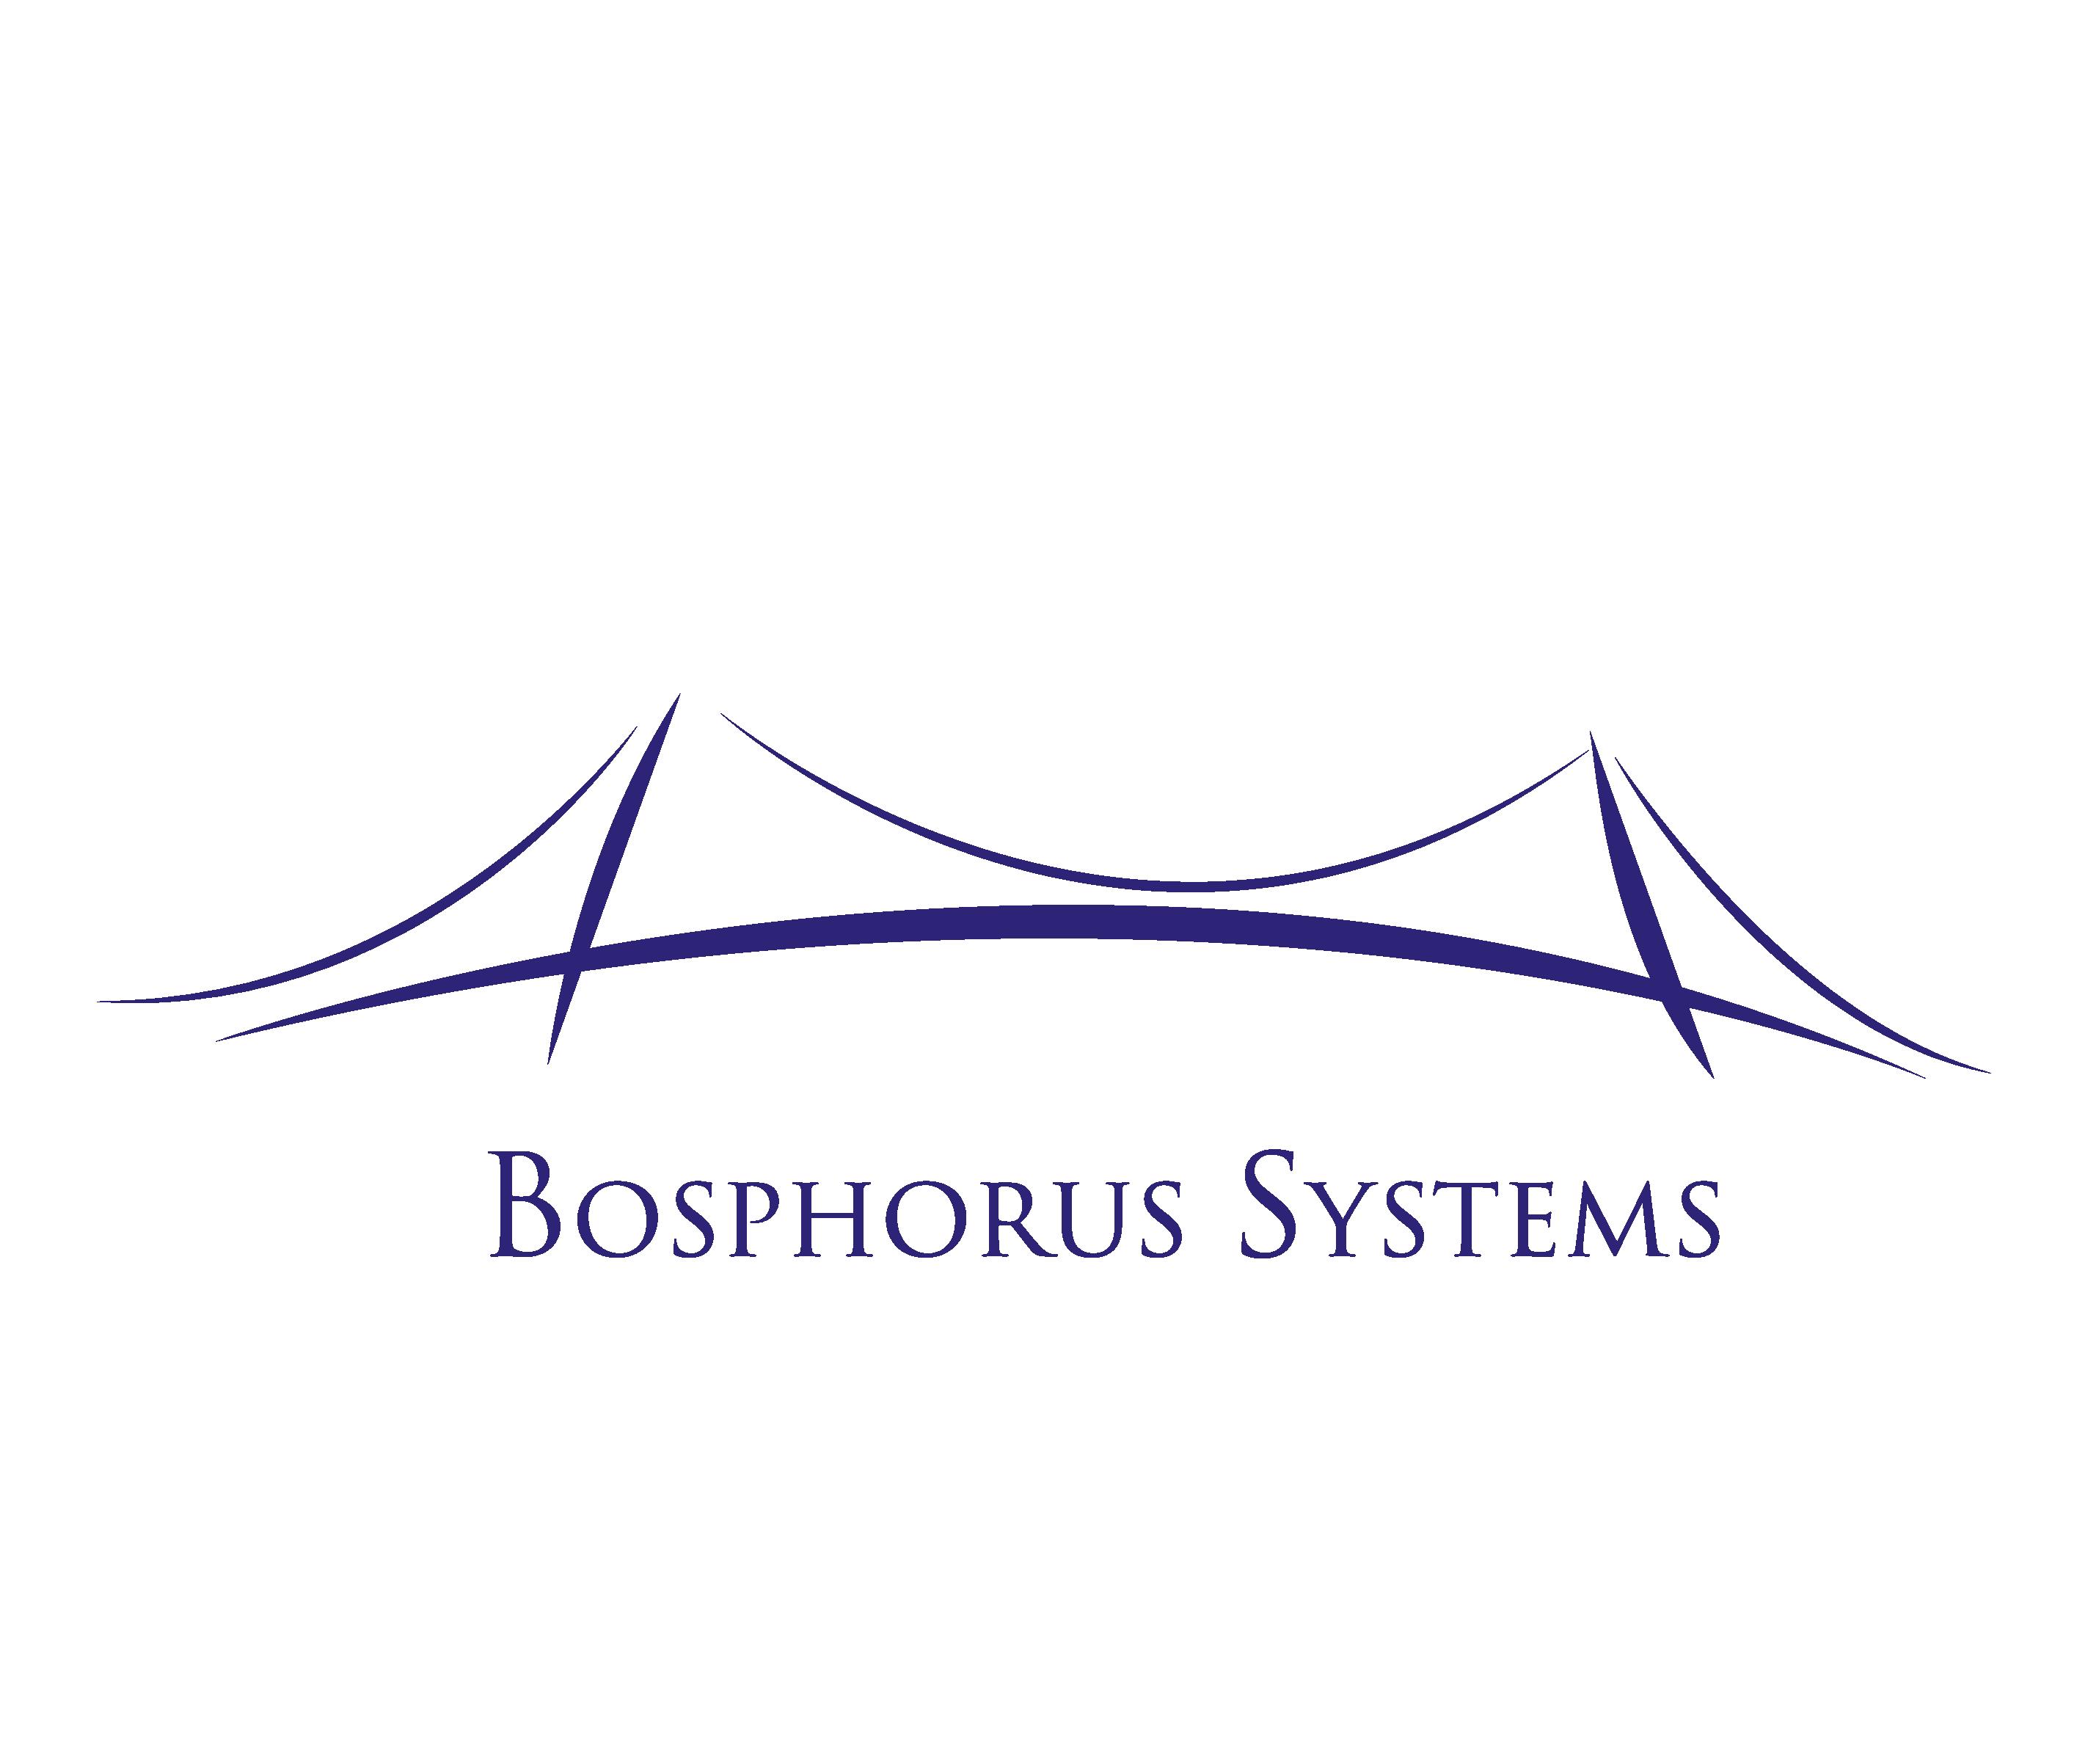 BOSPHORUS SYSTEMS